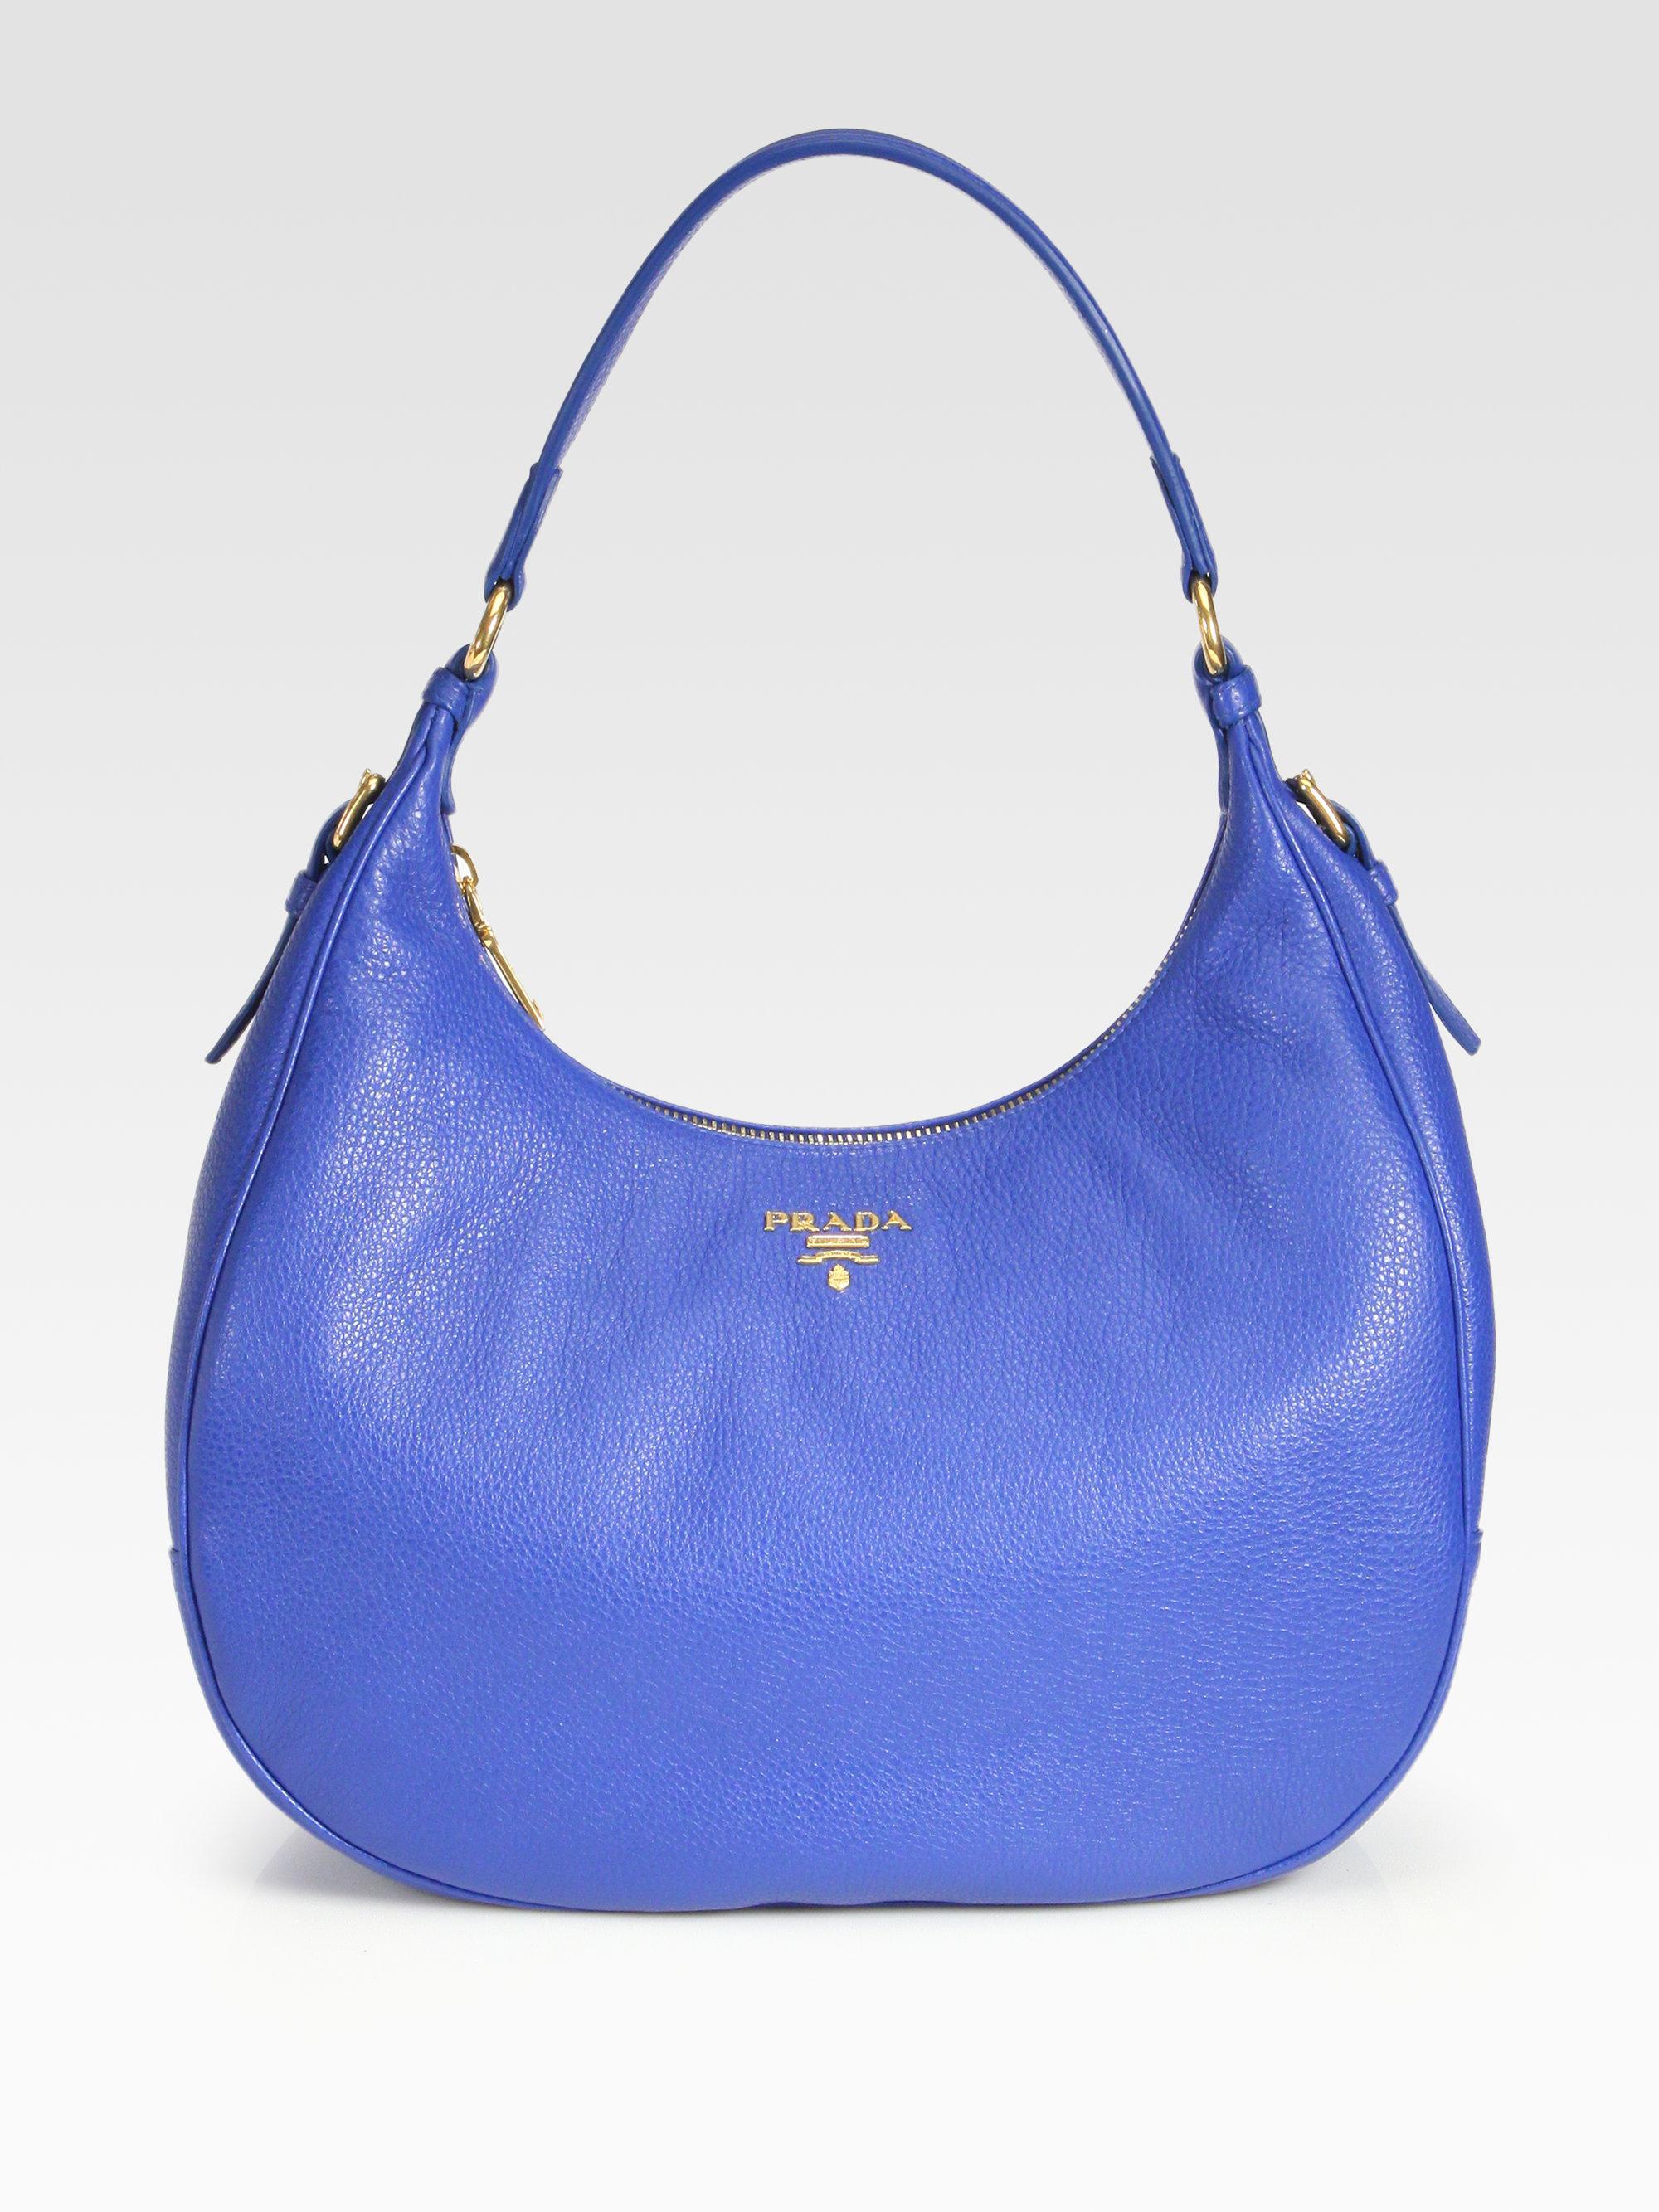 prada handbags for less - Prada Daino Hobo in Blue (azzurro-blue) | Lyst